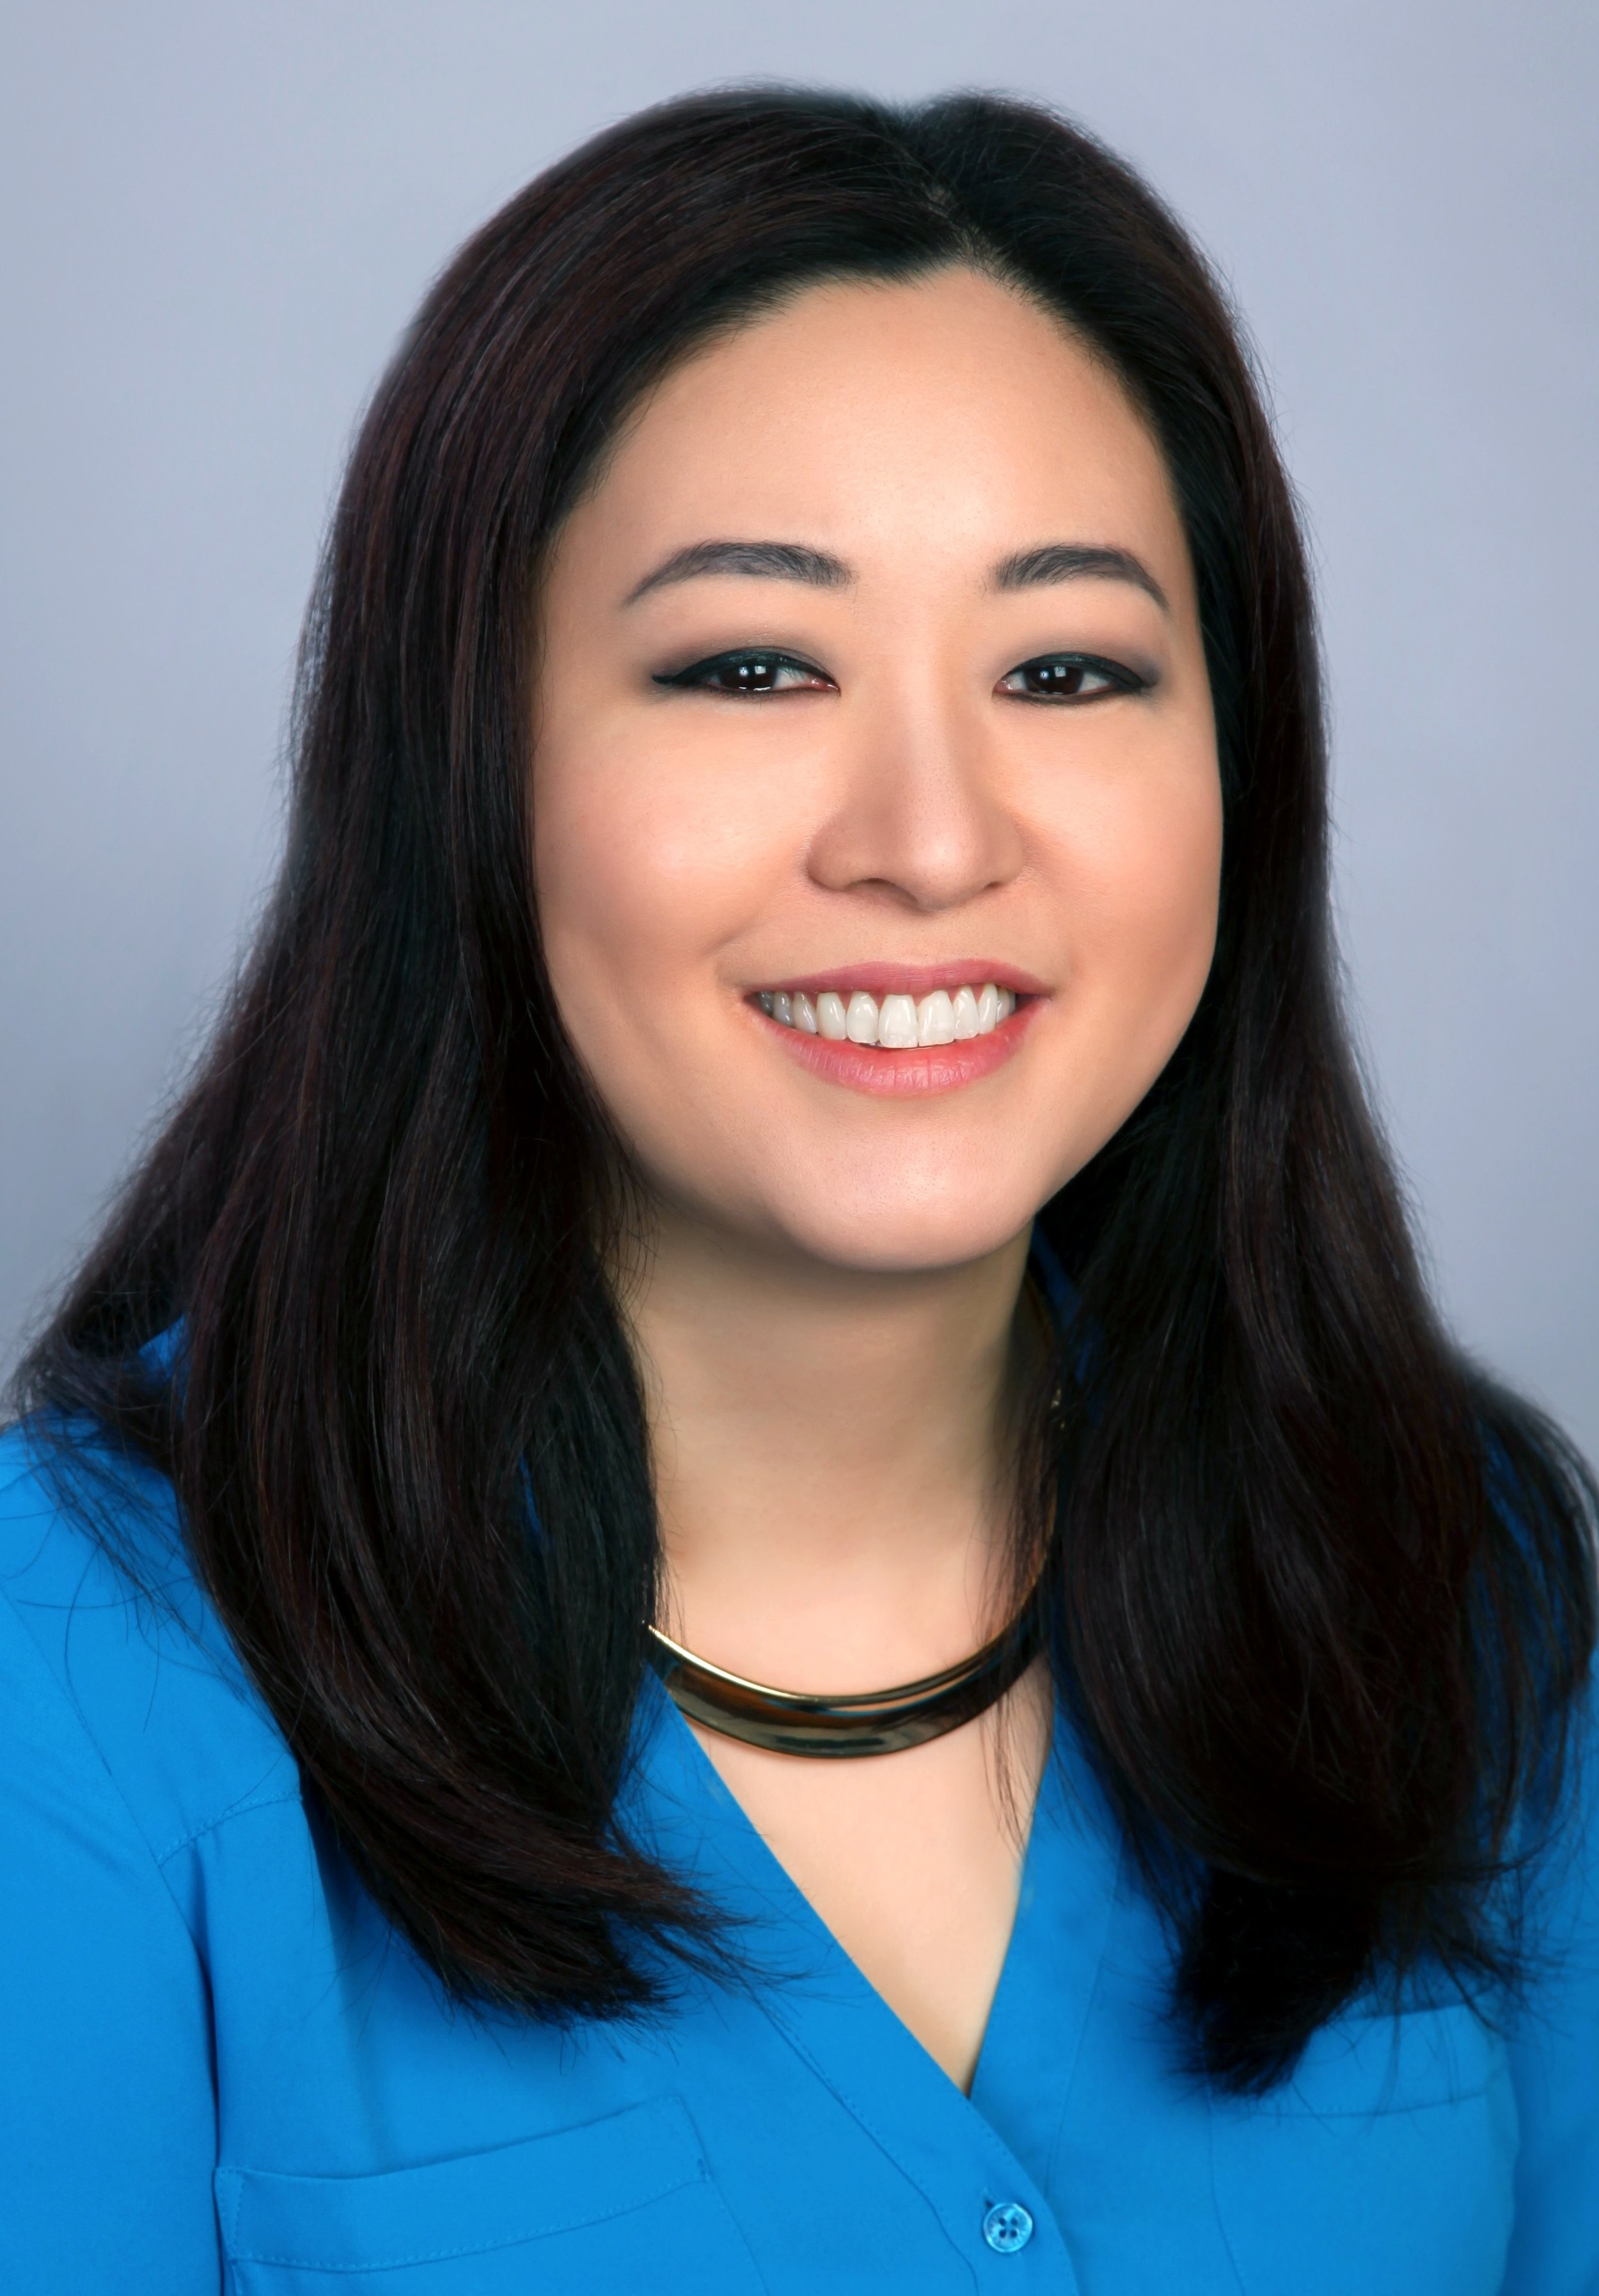 Vivian Chou